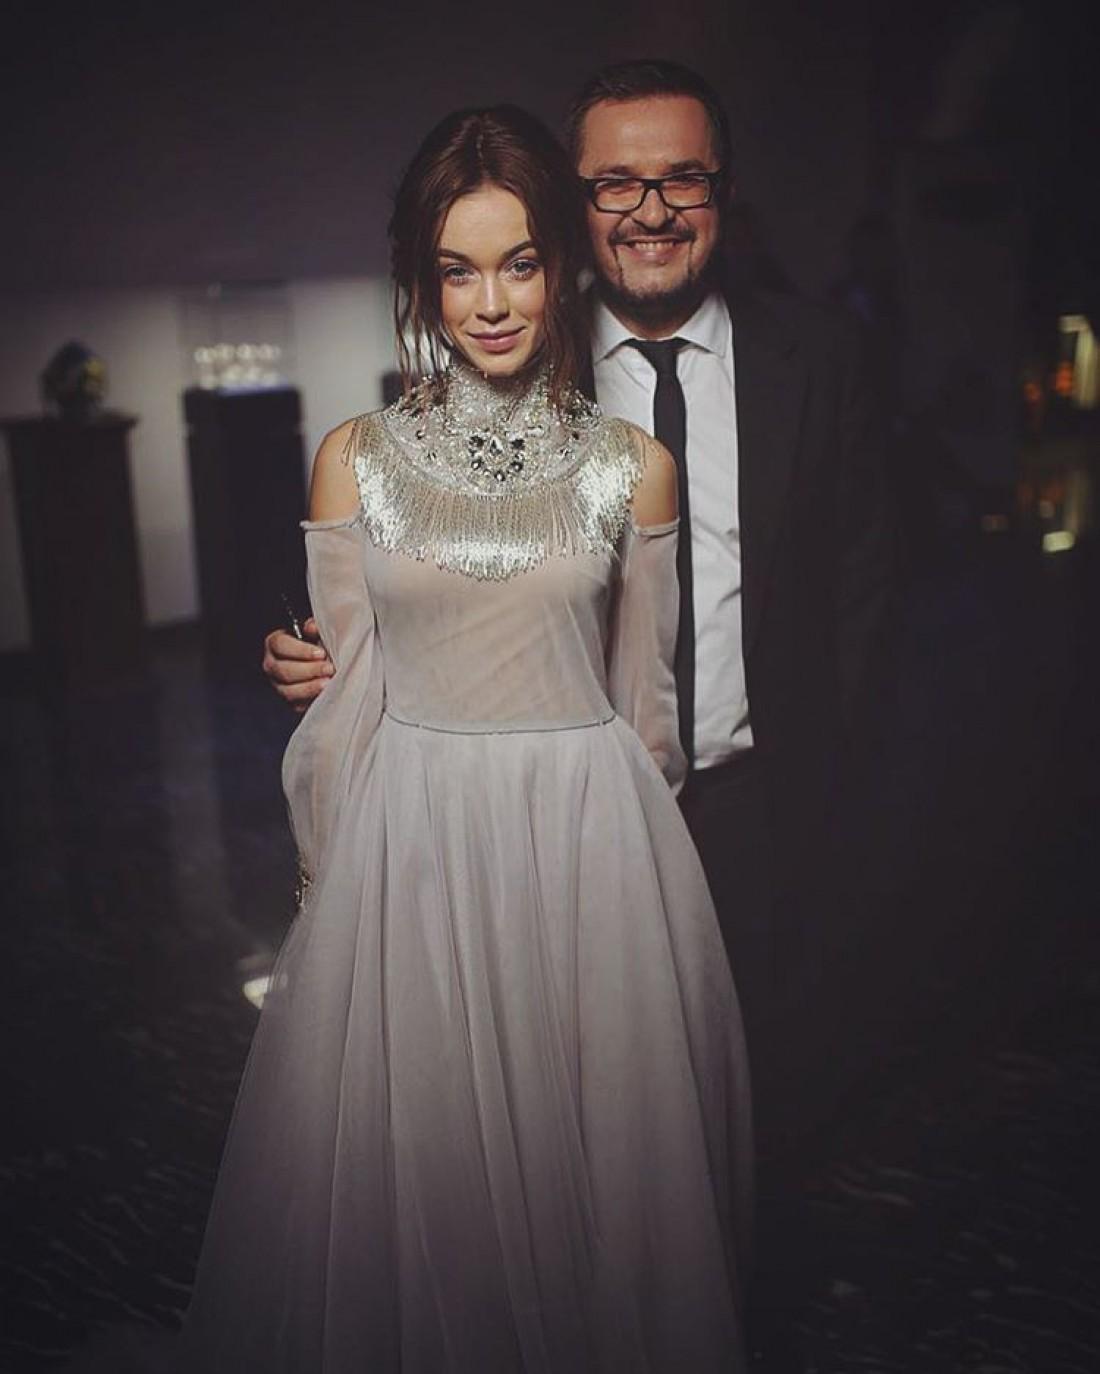 Мария Яремчук и Александр Пономарев на балу Viva